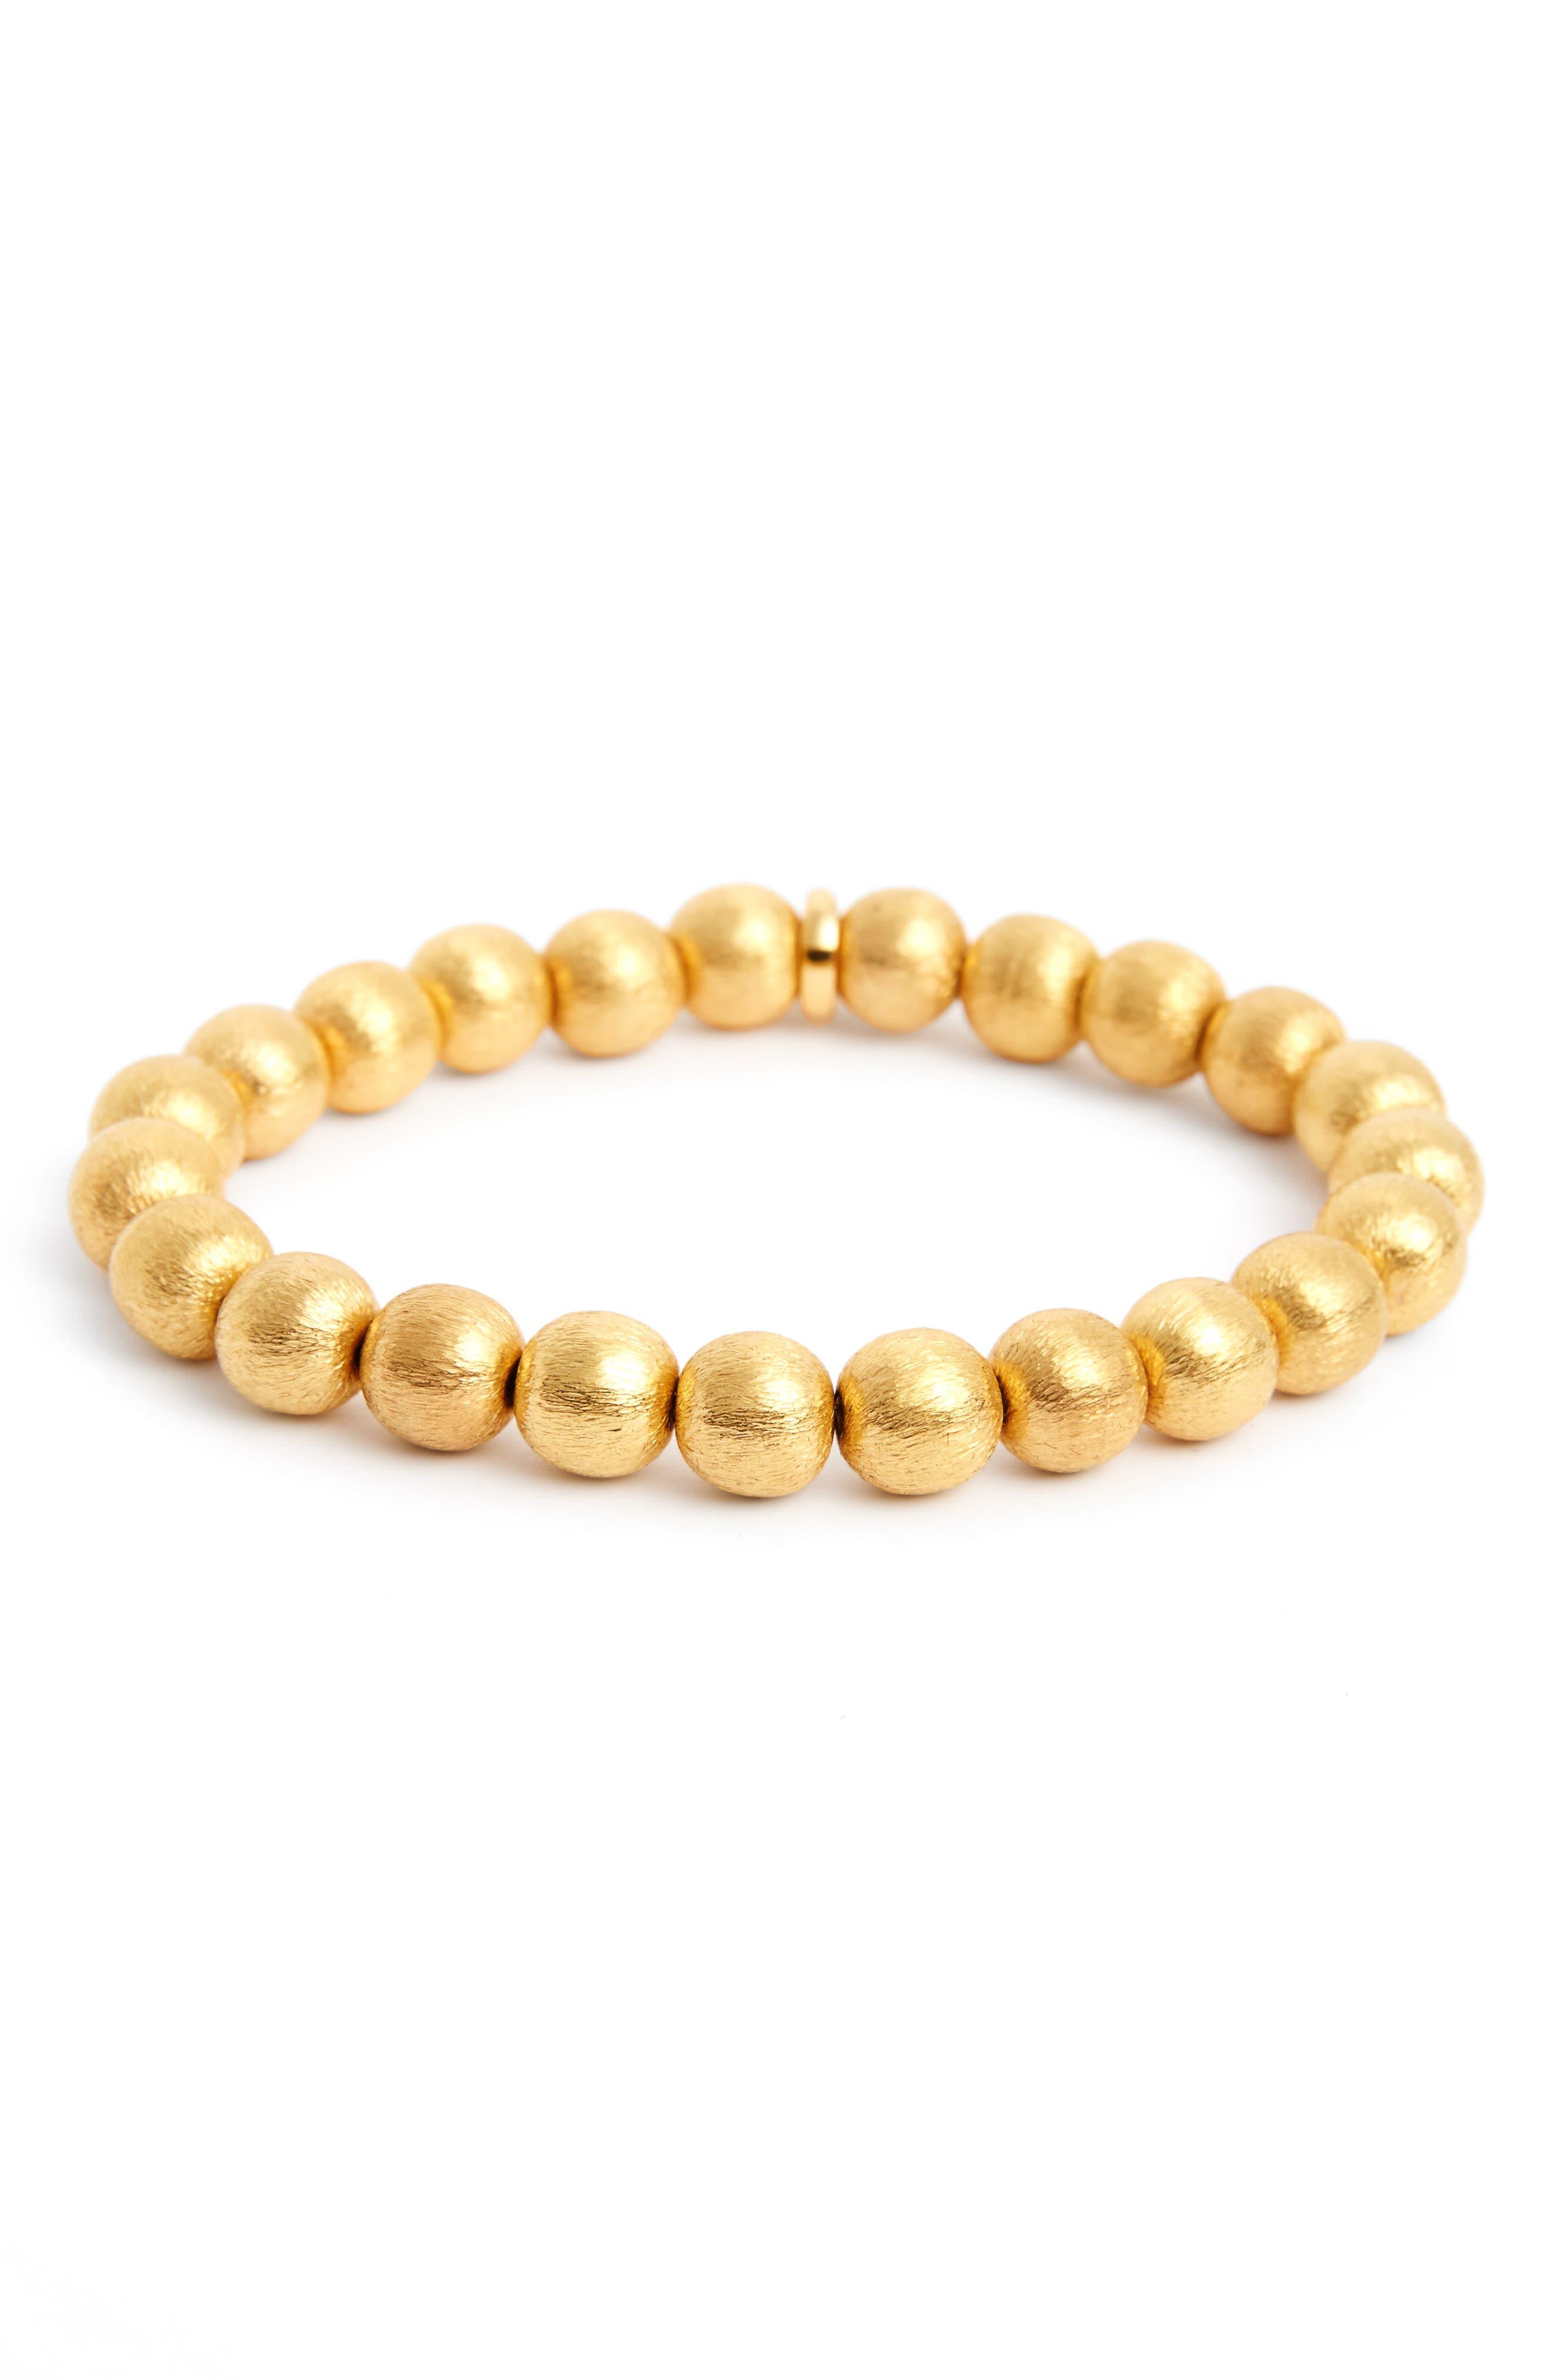 Sphere Zen Elastic Bracelet,                         Main,                         color, Gold